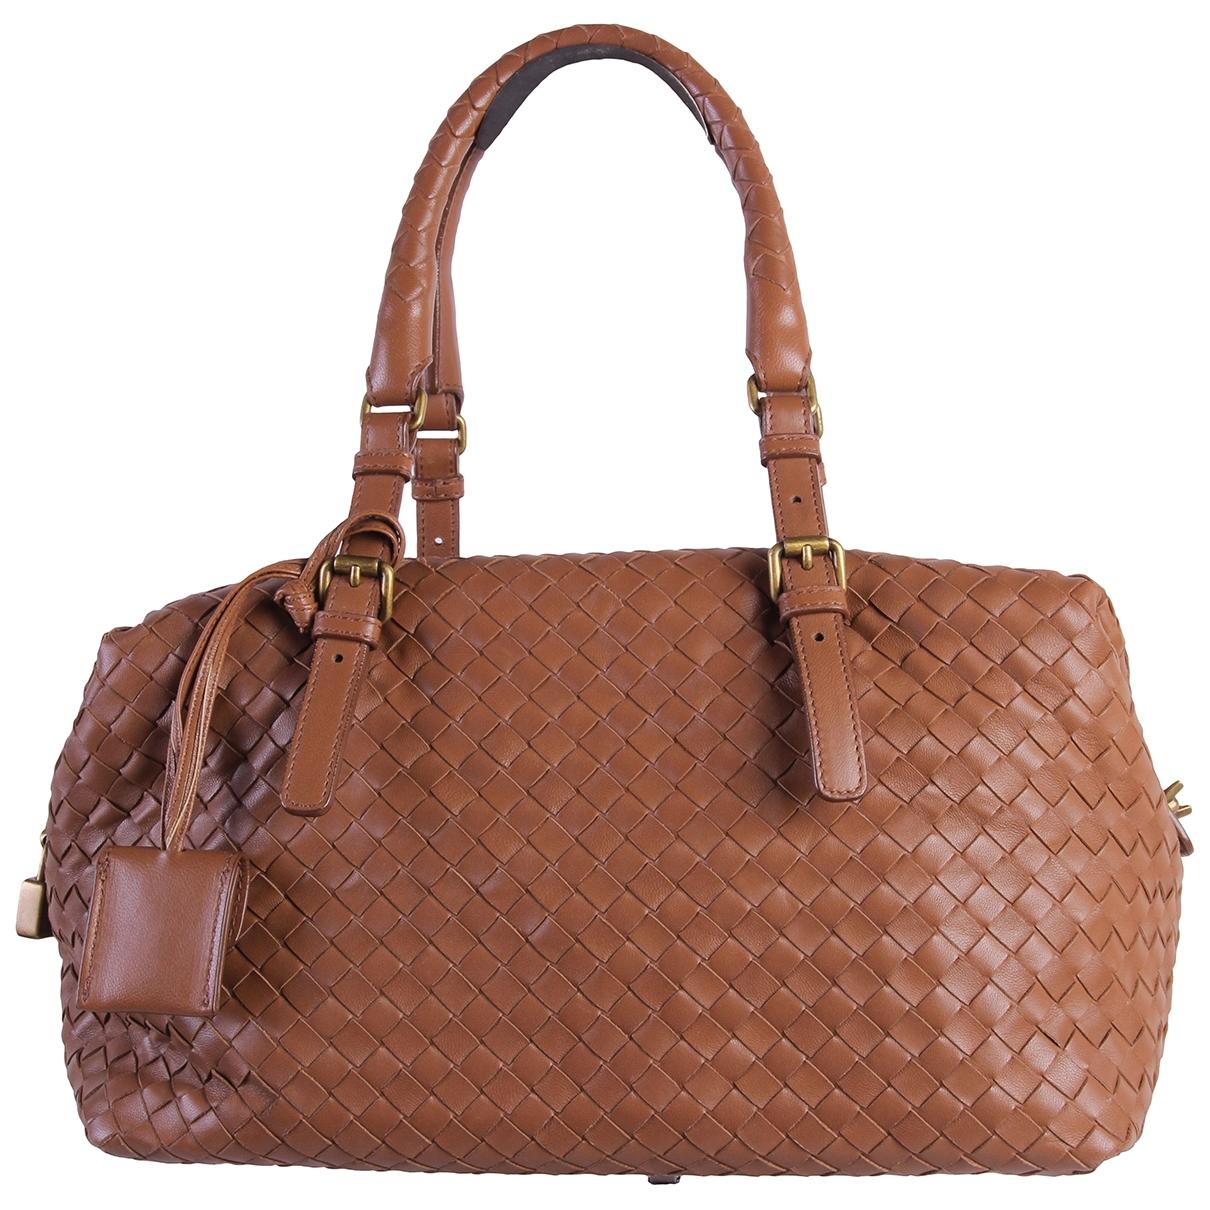 Bottega Veneta \N Handtasche in  Braun Leder